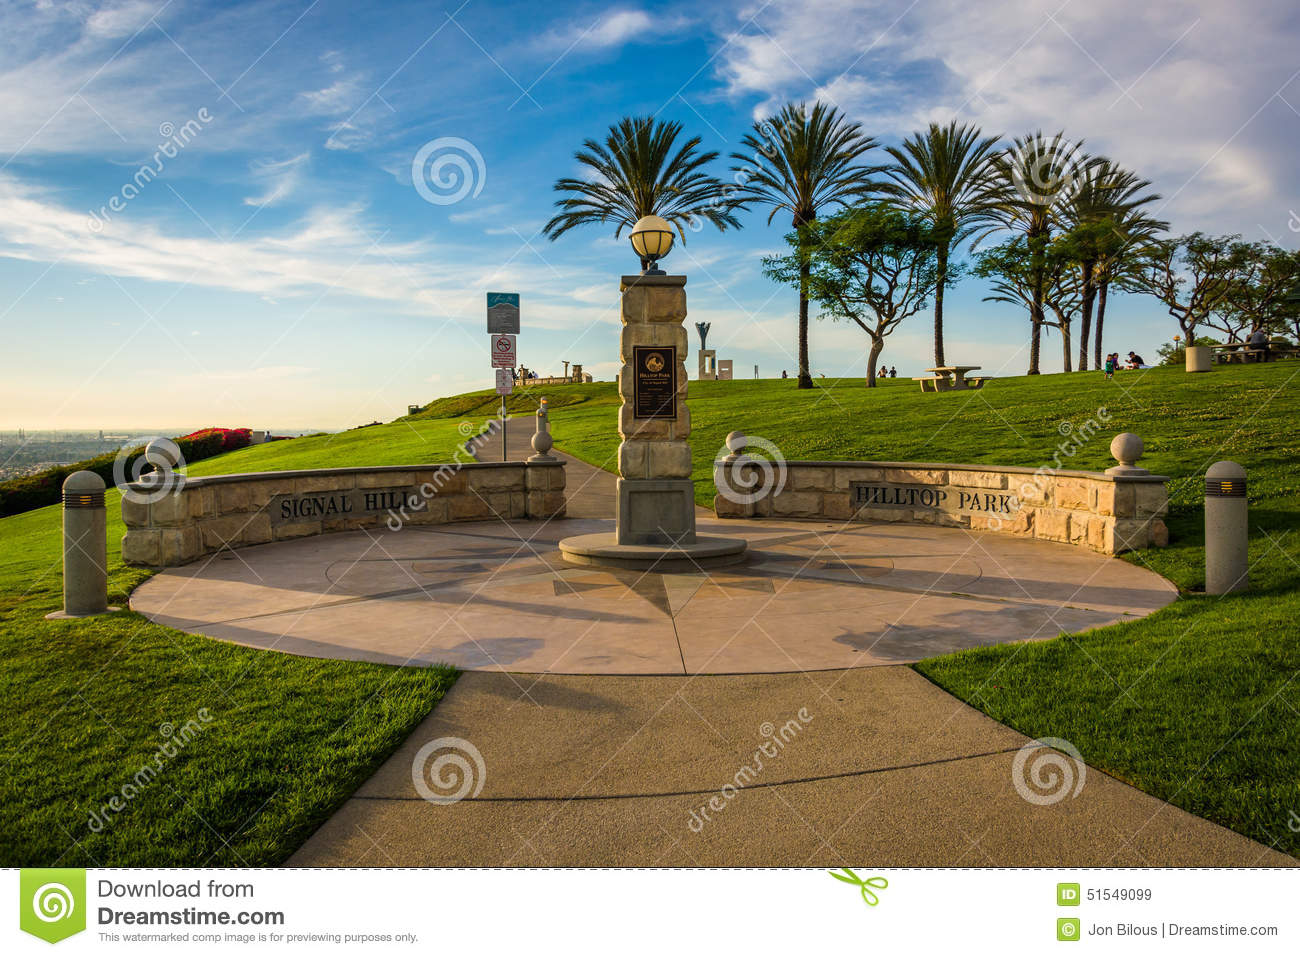 Hilltop Park, In Signal Hill, Long Beach Stock Photo.